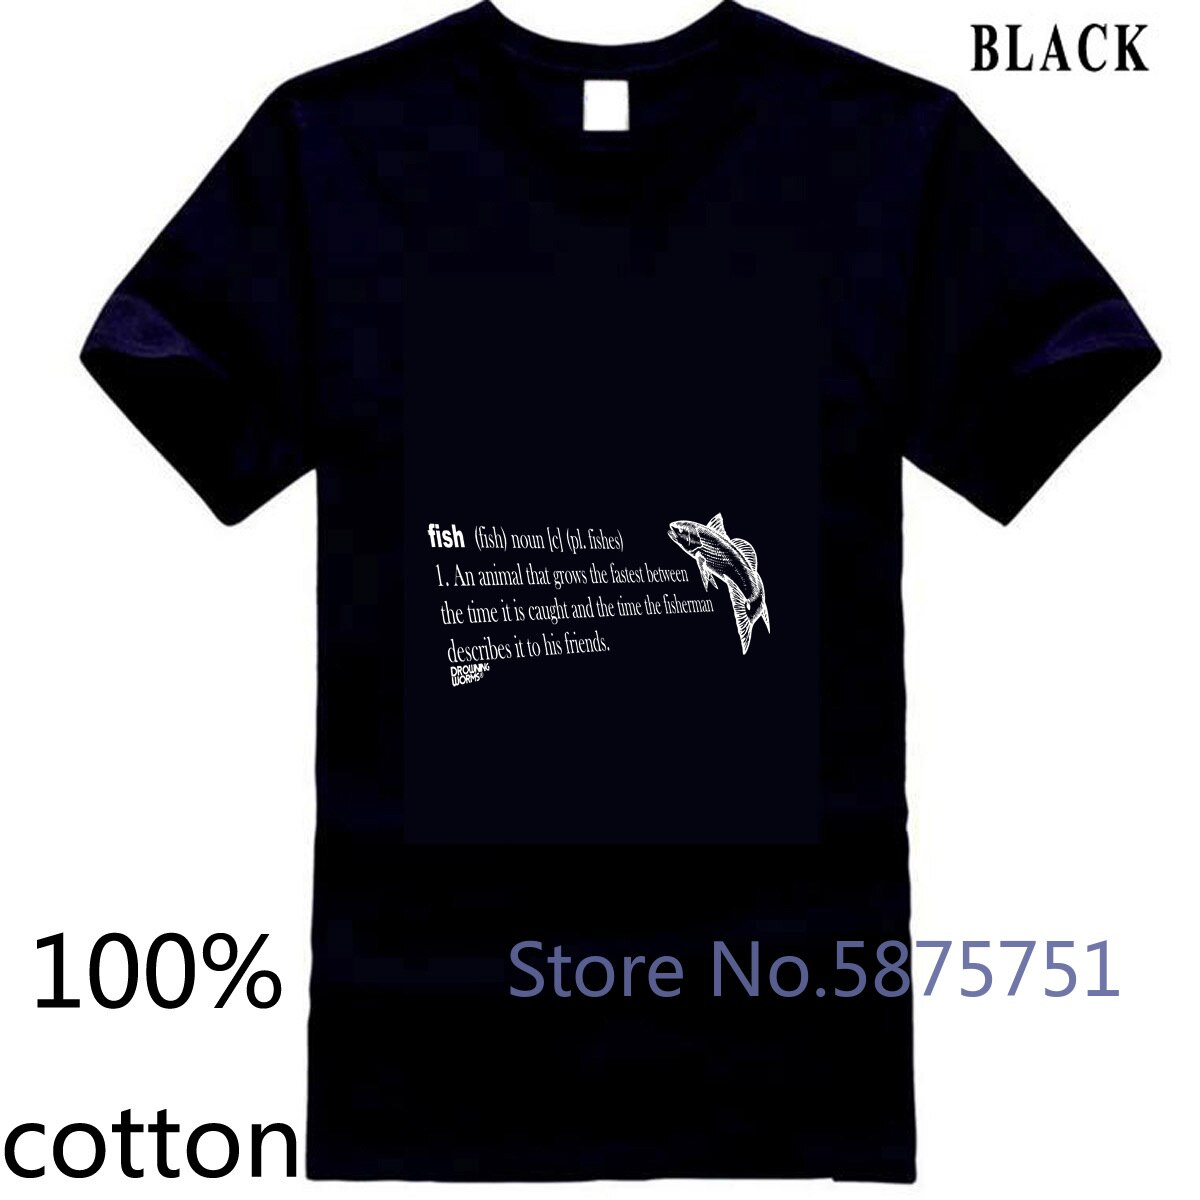 Fish Noun MENS 익사 웜 생일 기어 태클 낚시꾼 디자인 남자 티셔츠 티셔츠 탑스 티즈 100% 코튼